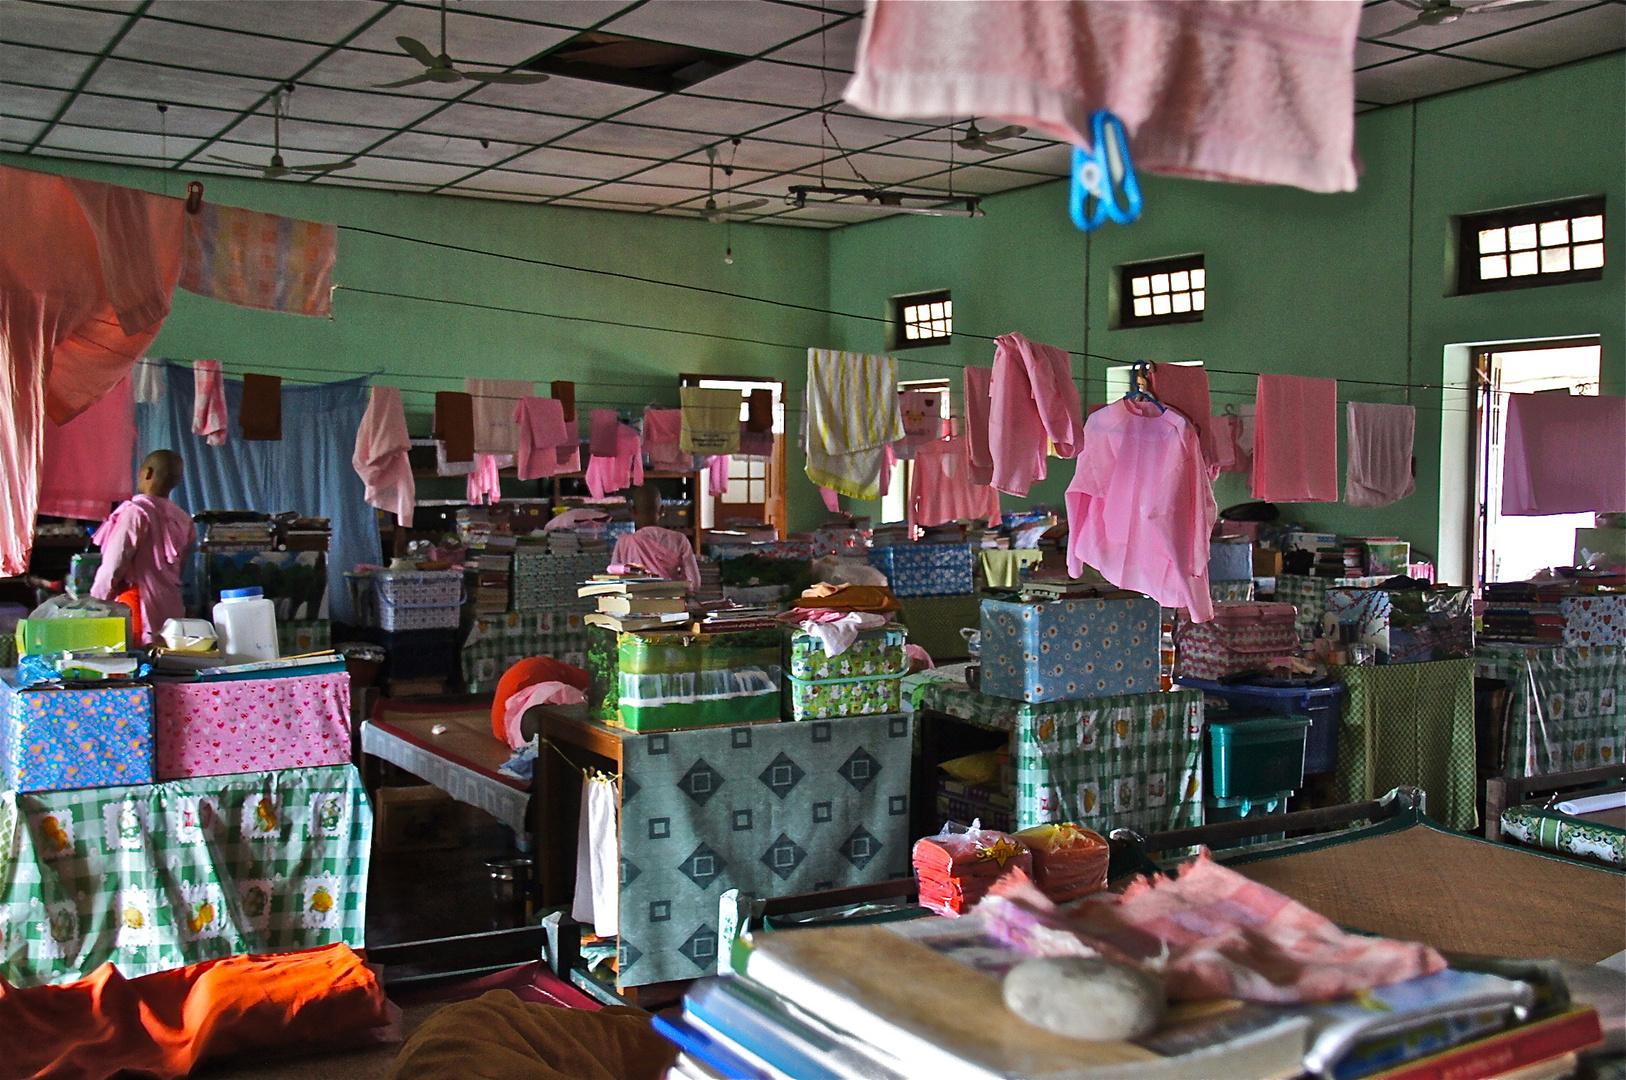 schlafsaal im nonnenkloster, yangon, burma 2011